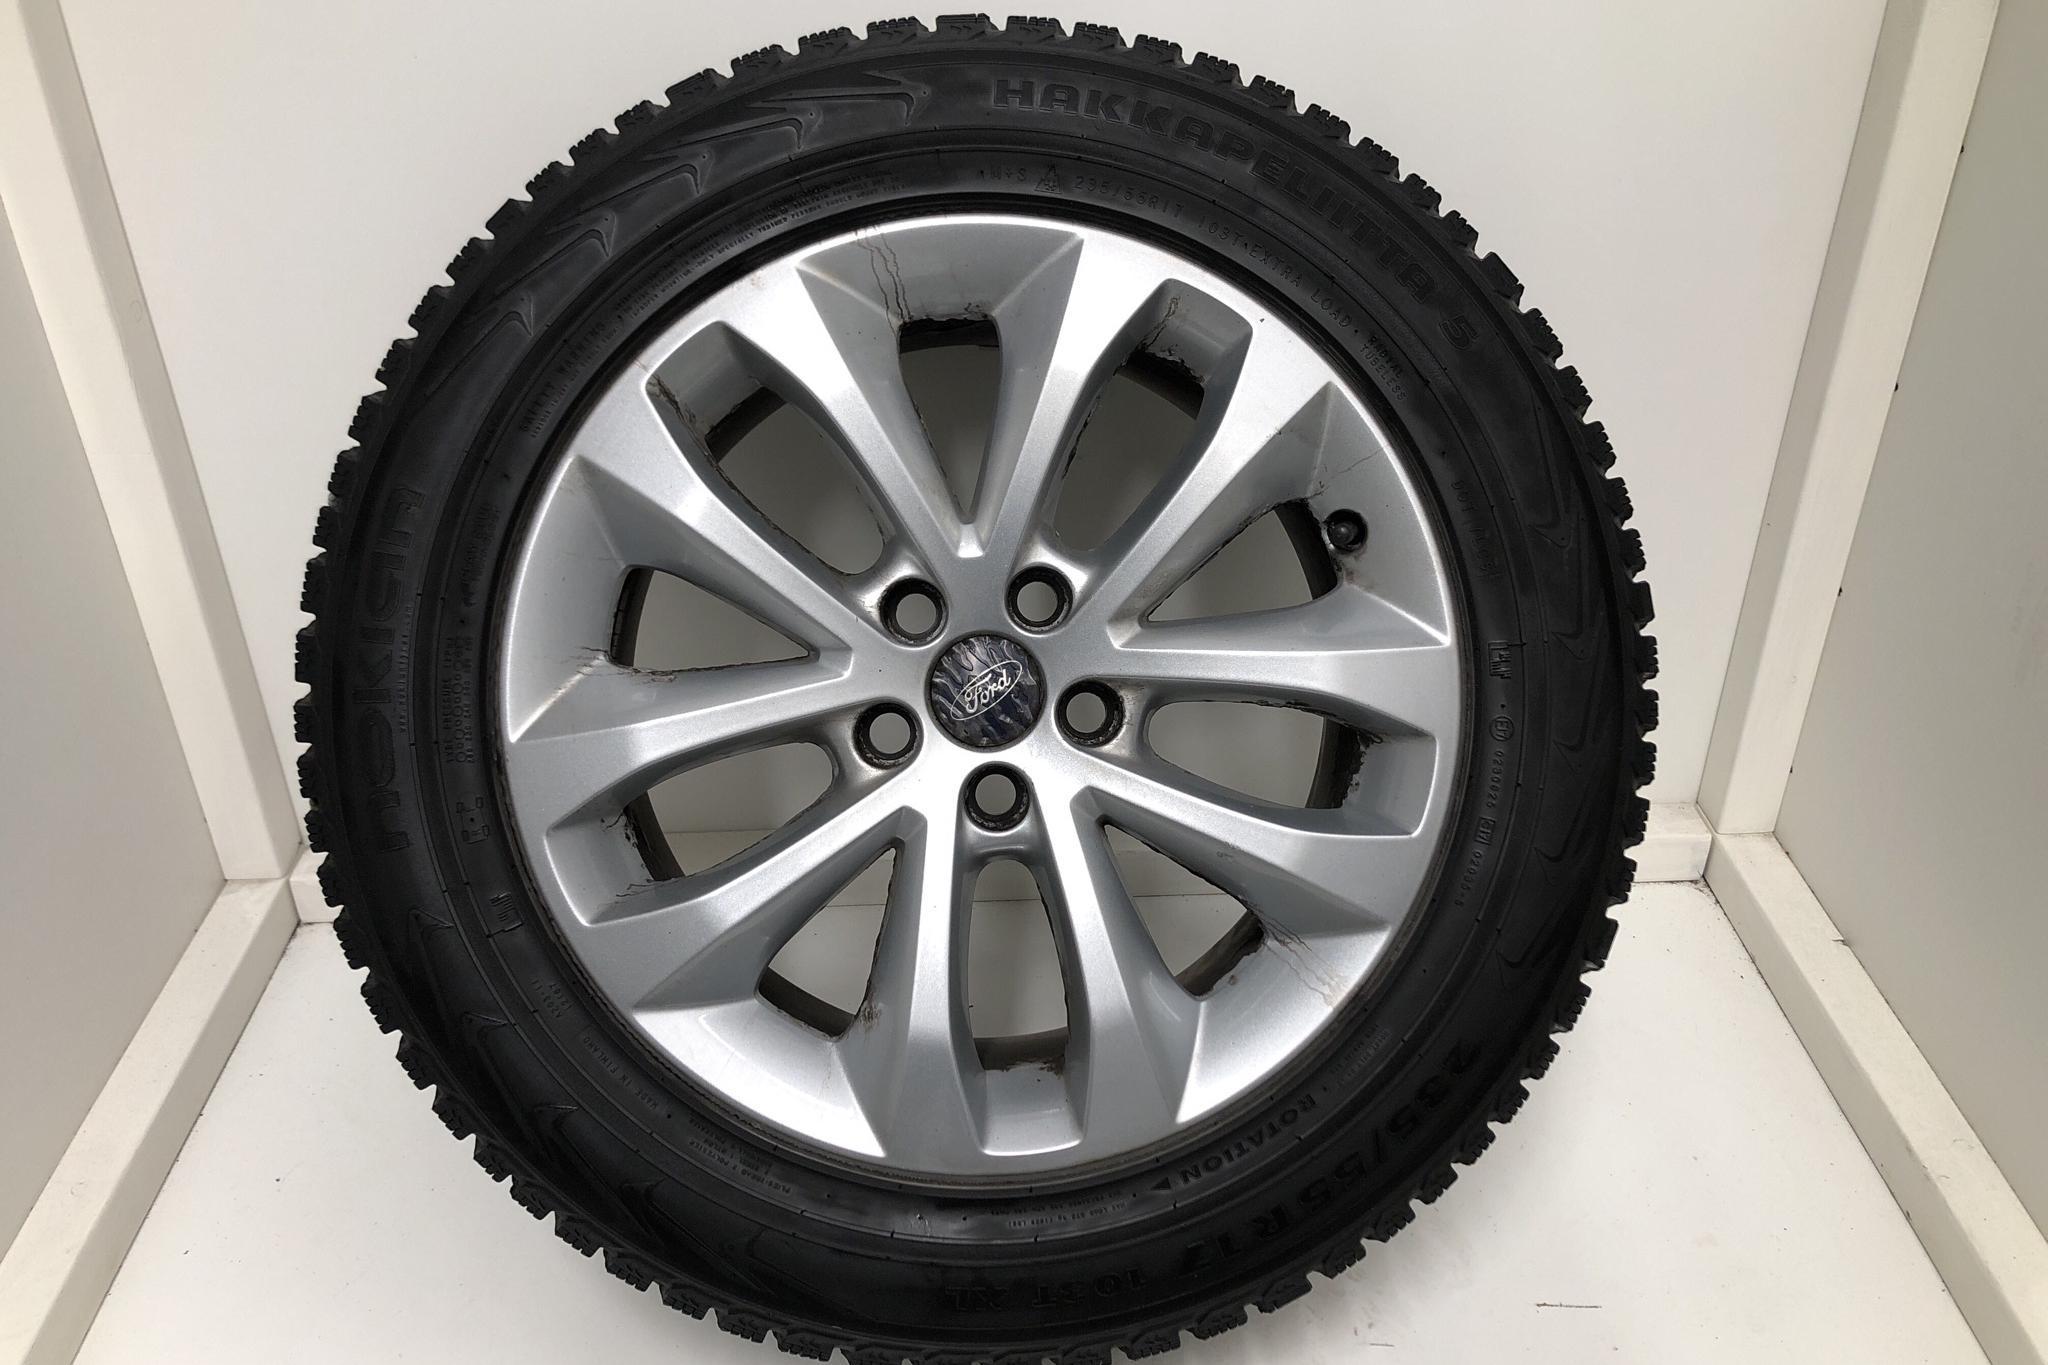 Ford Kuga 2.0 TDCi AWD (140hk) - 100 940 km - Manual - white - 2012